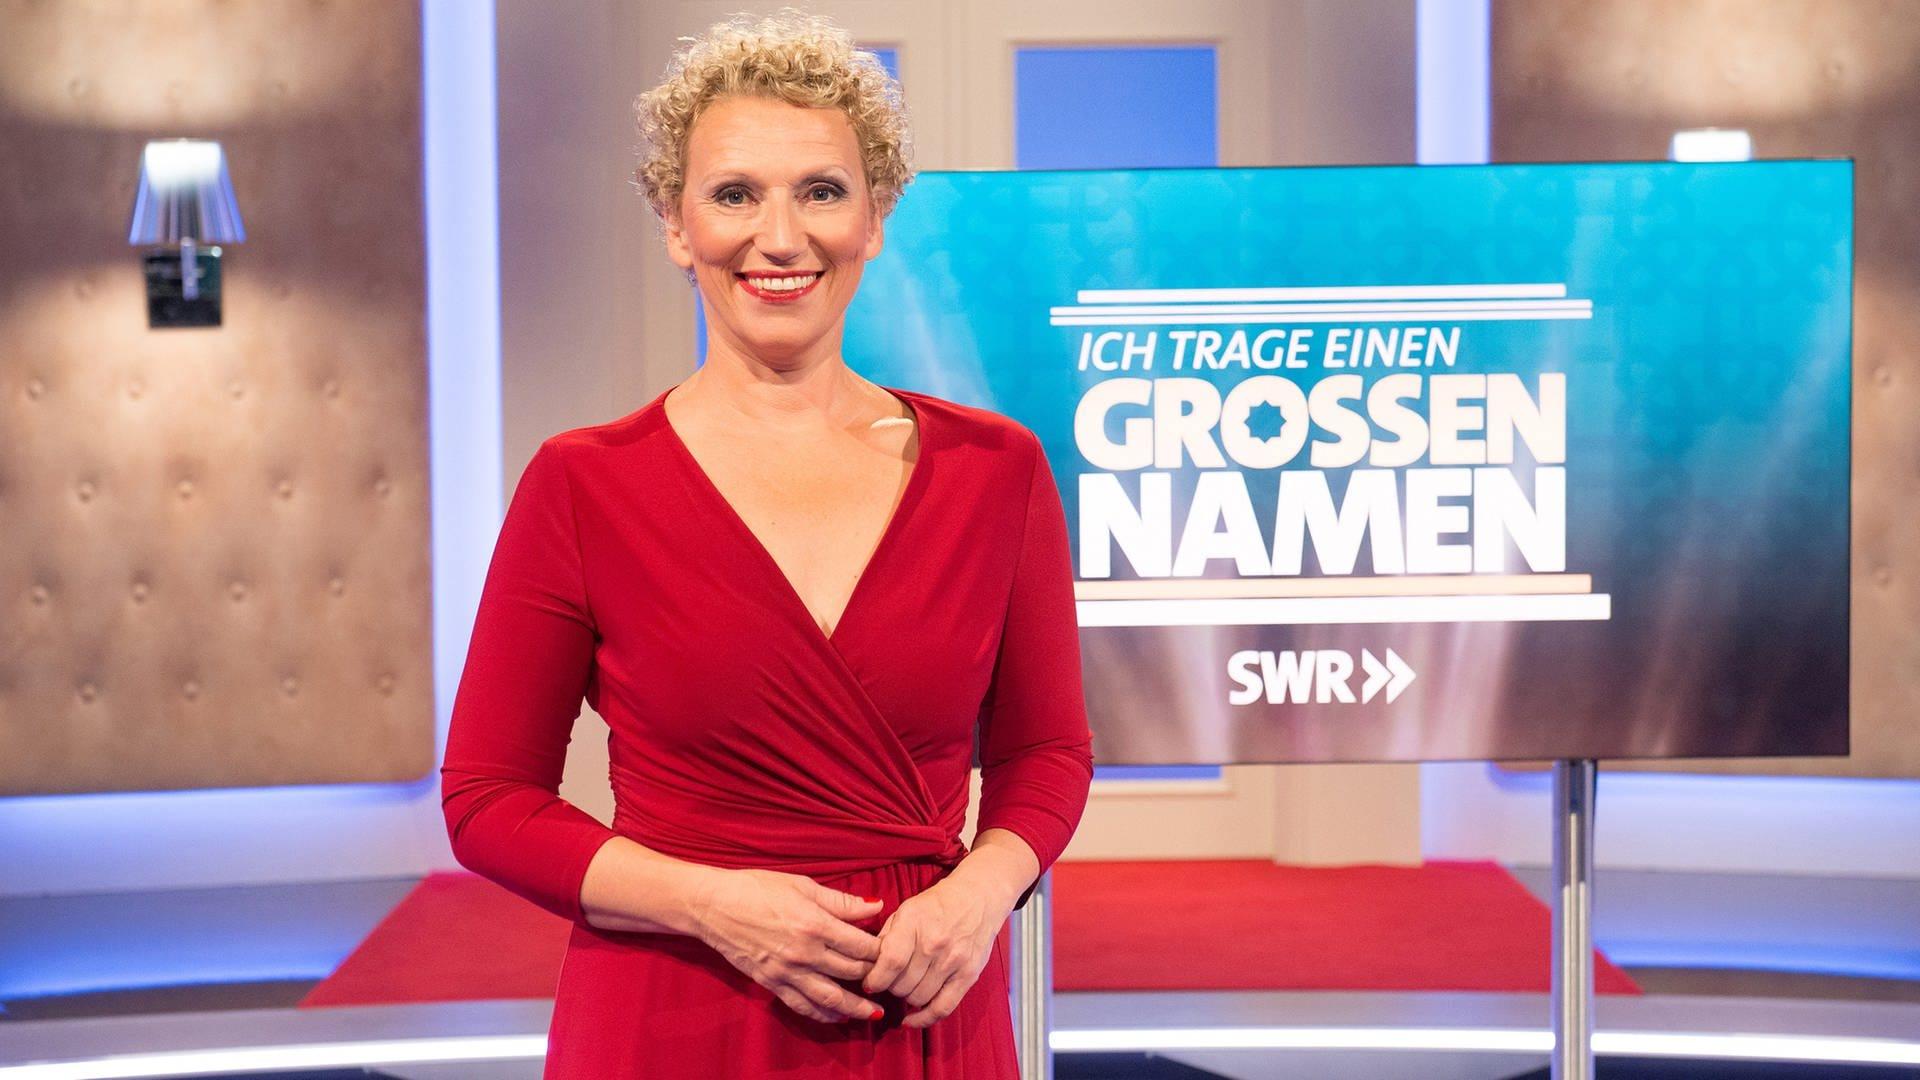 Swr Tv Heute